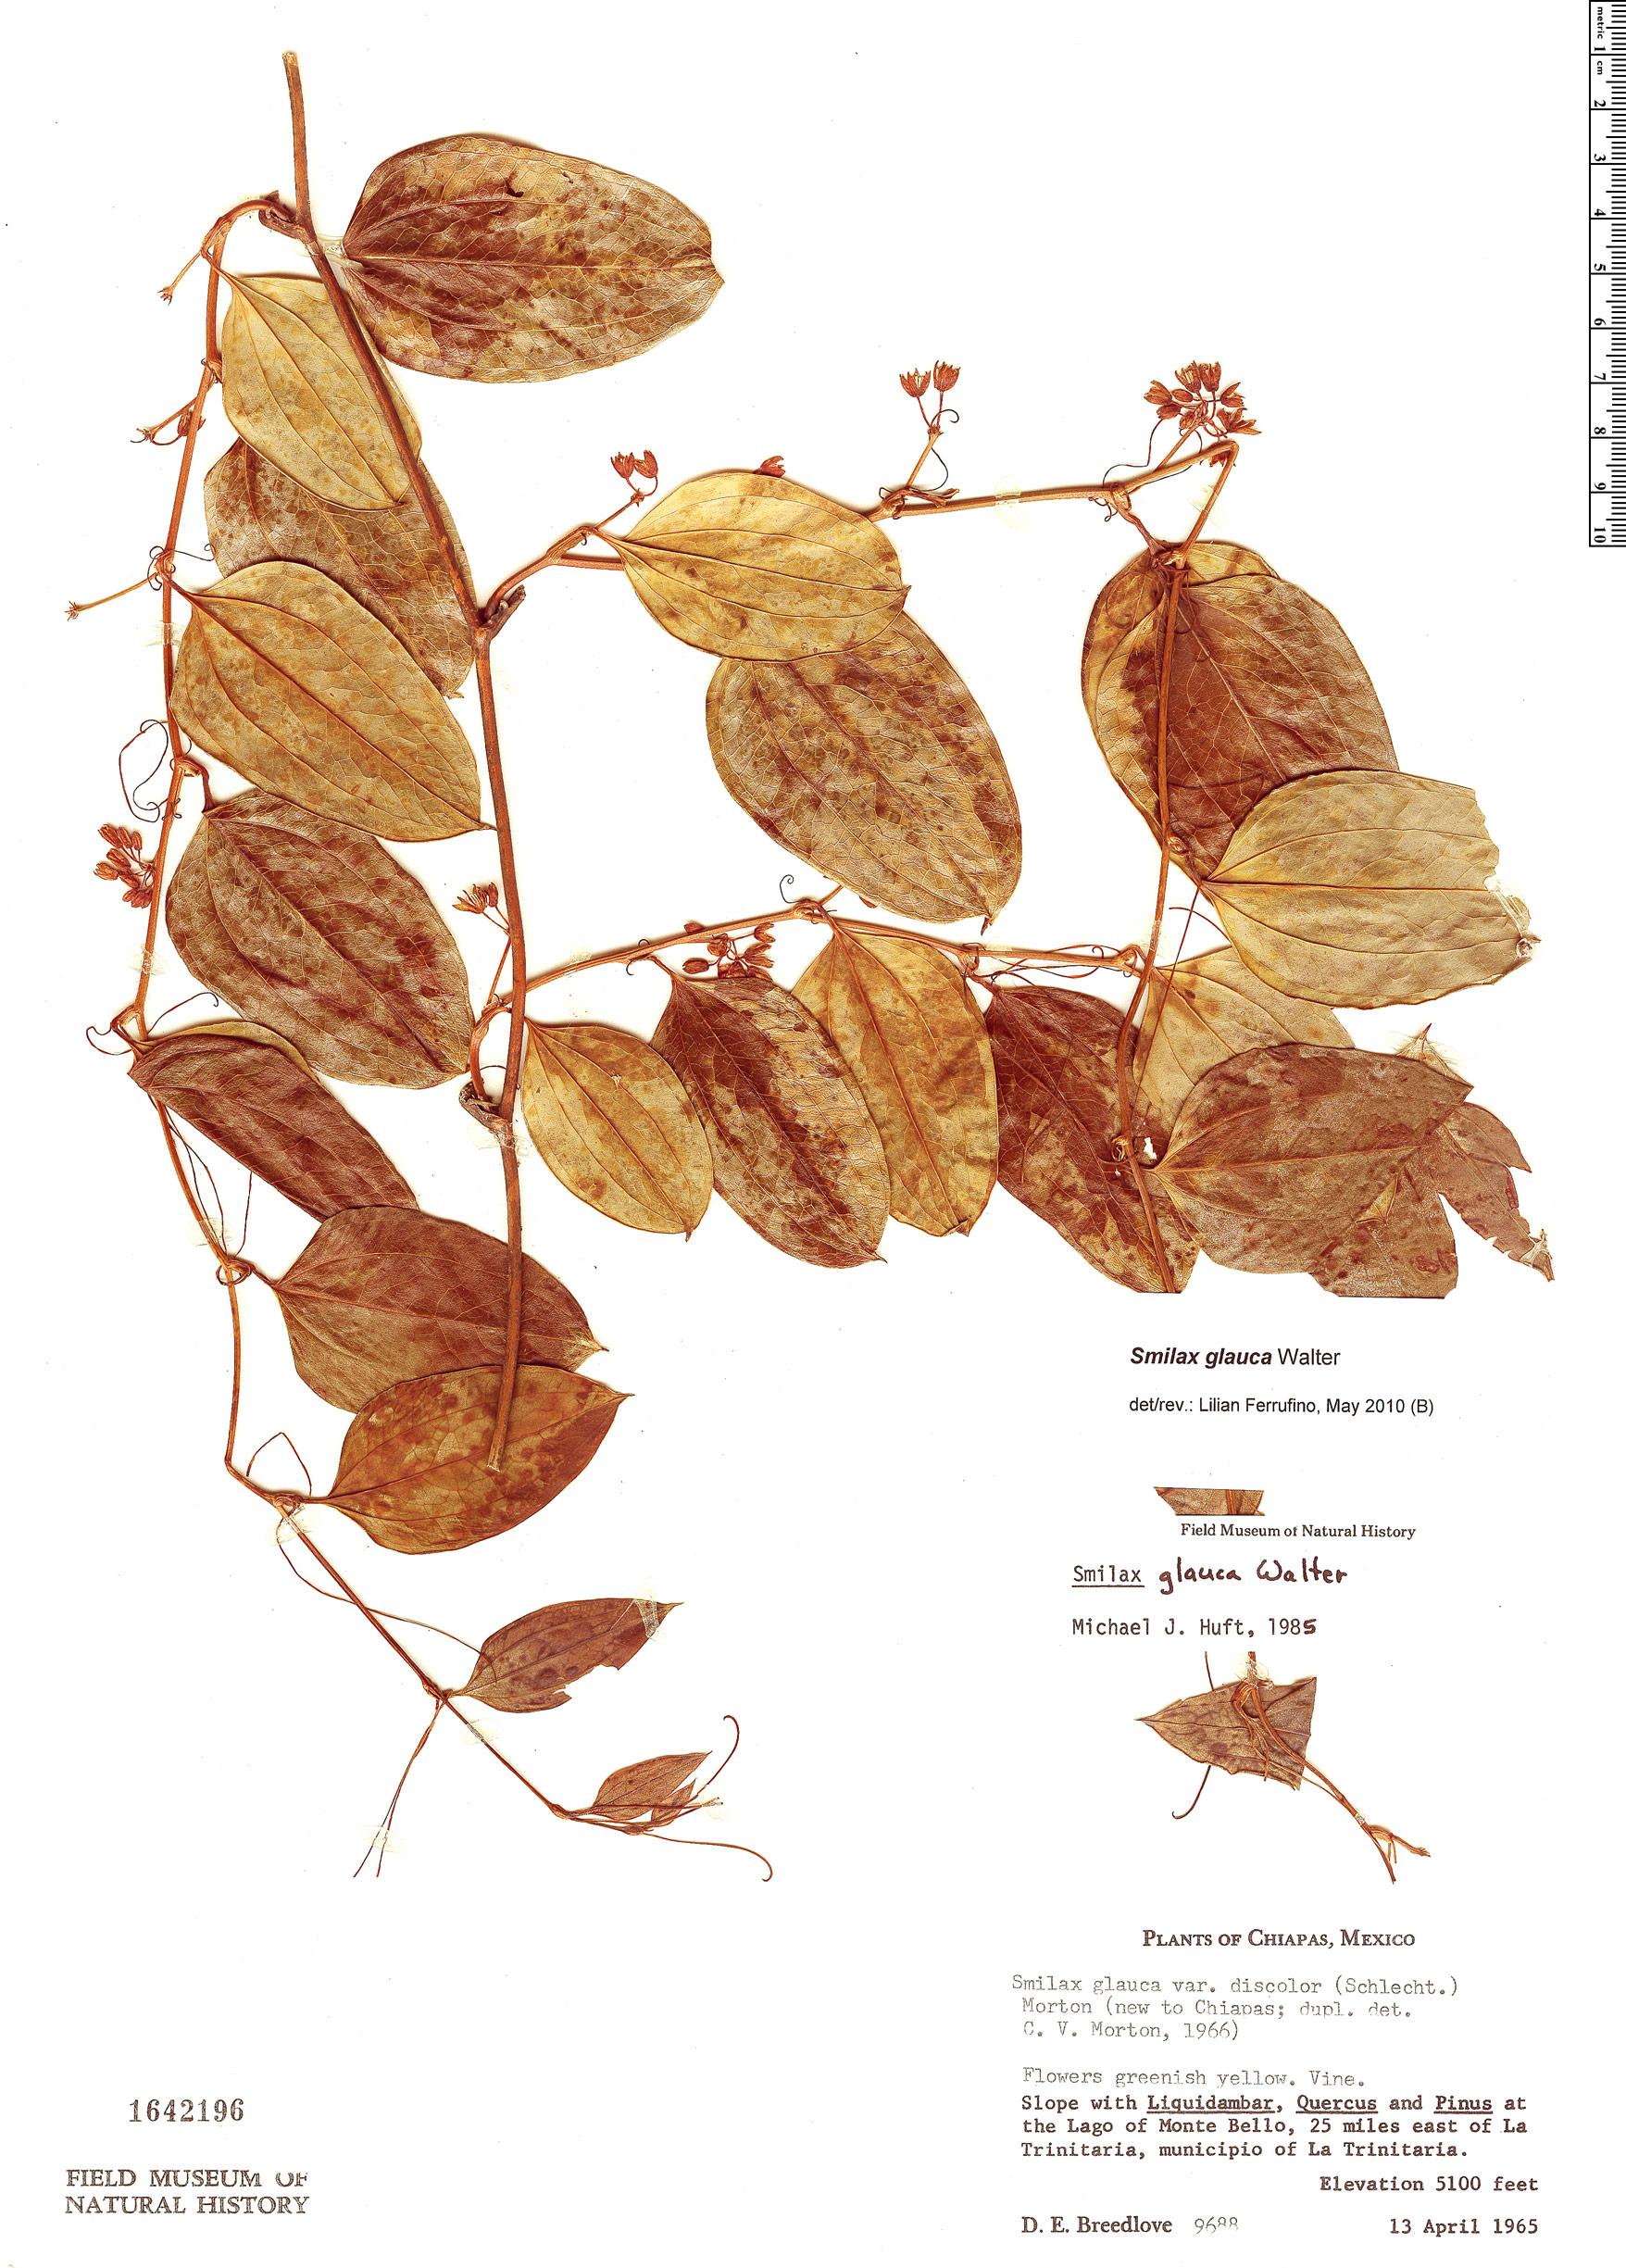 Specimen: Smilax glauca